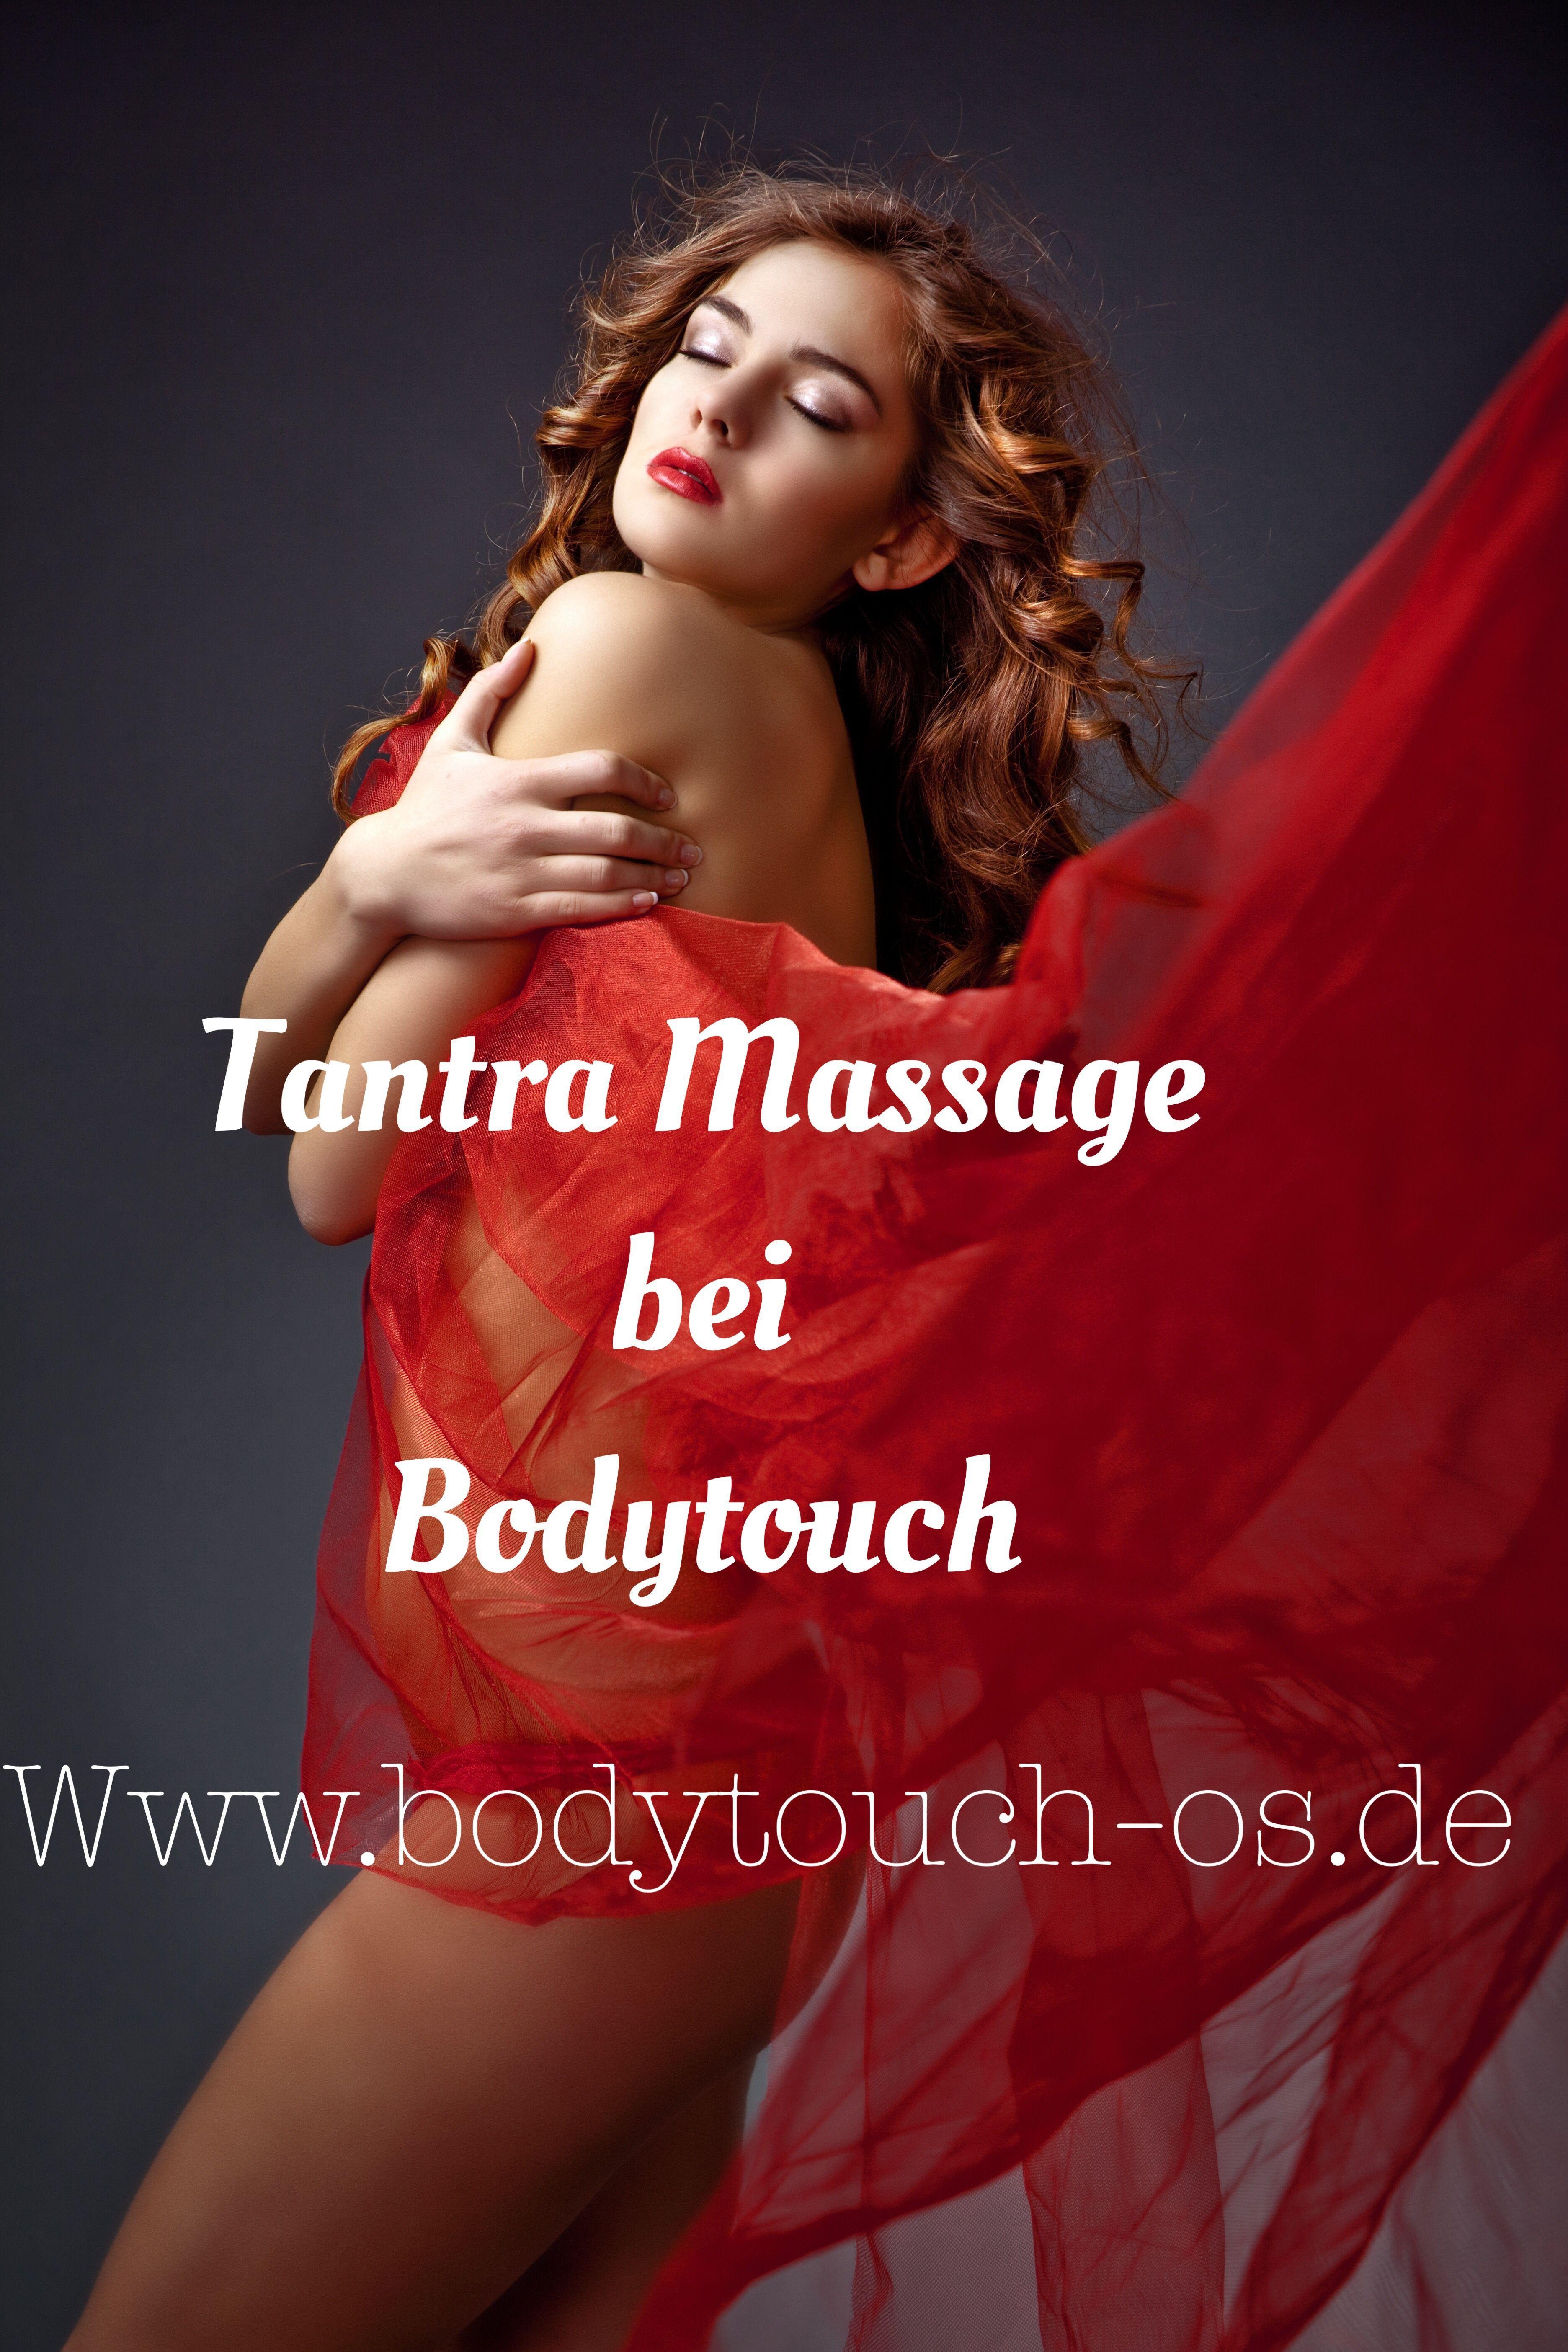 Tantra Massage Osnabrück